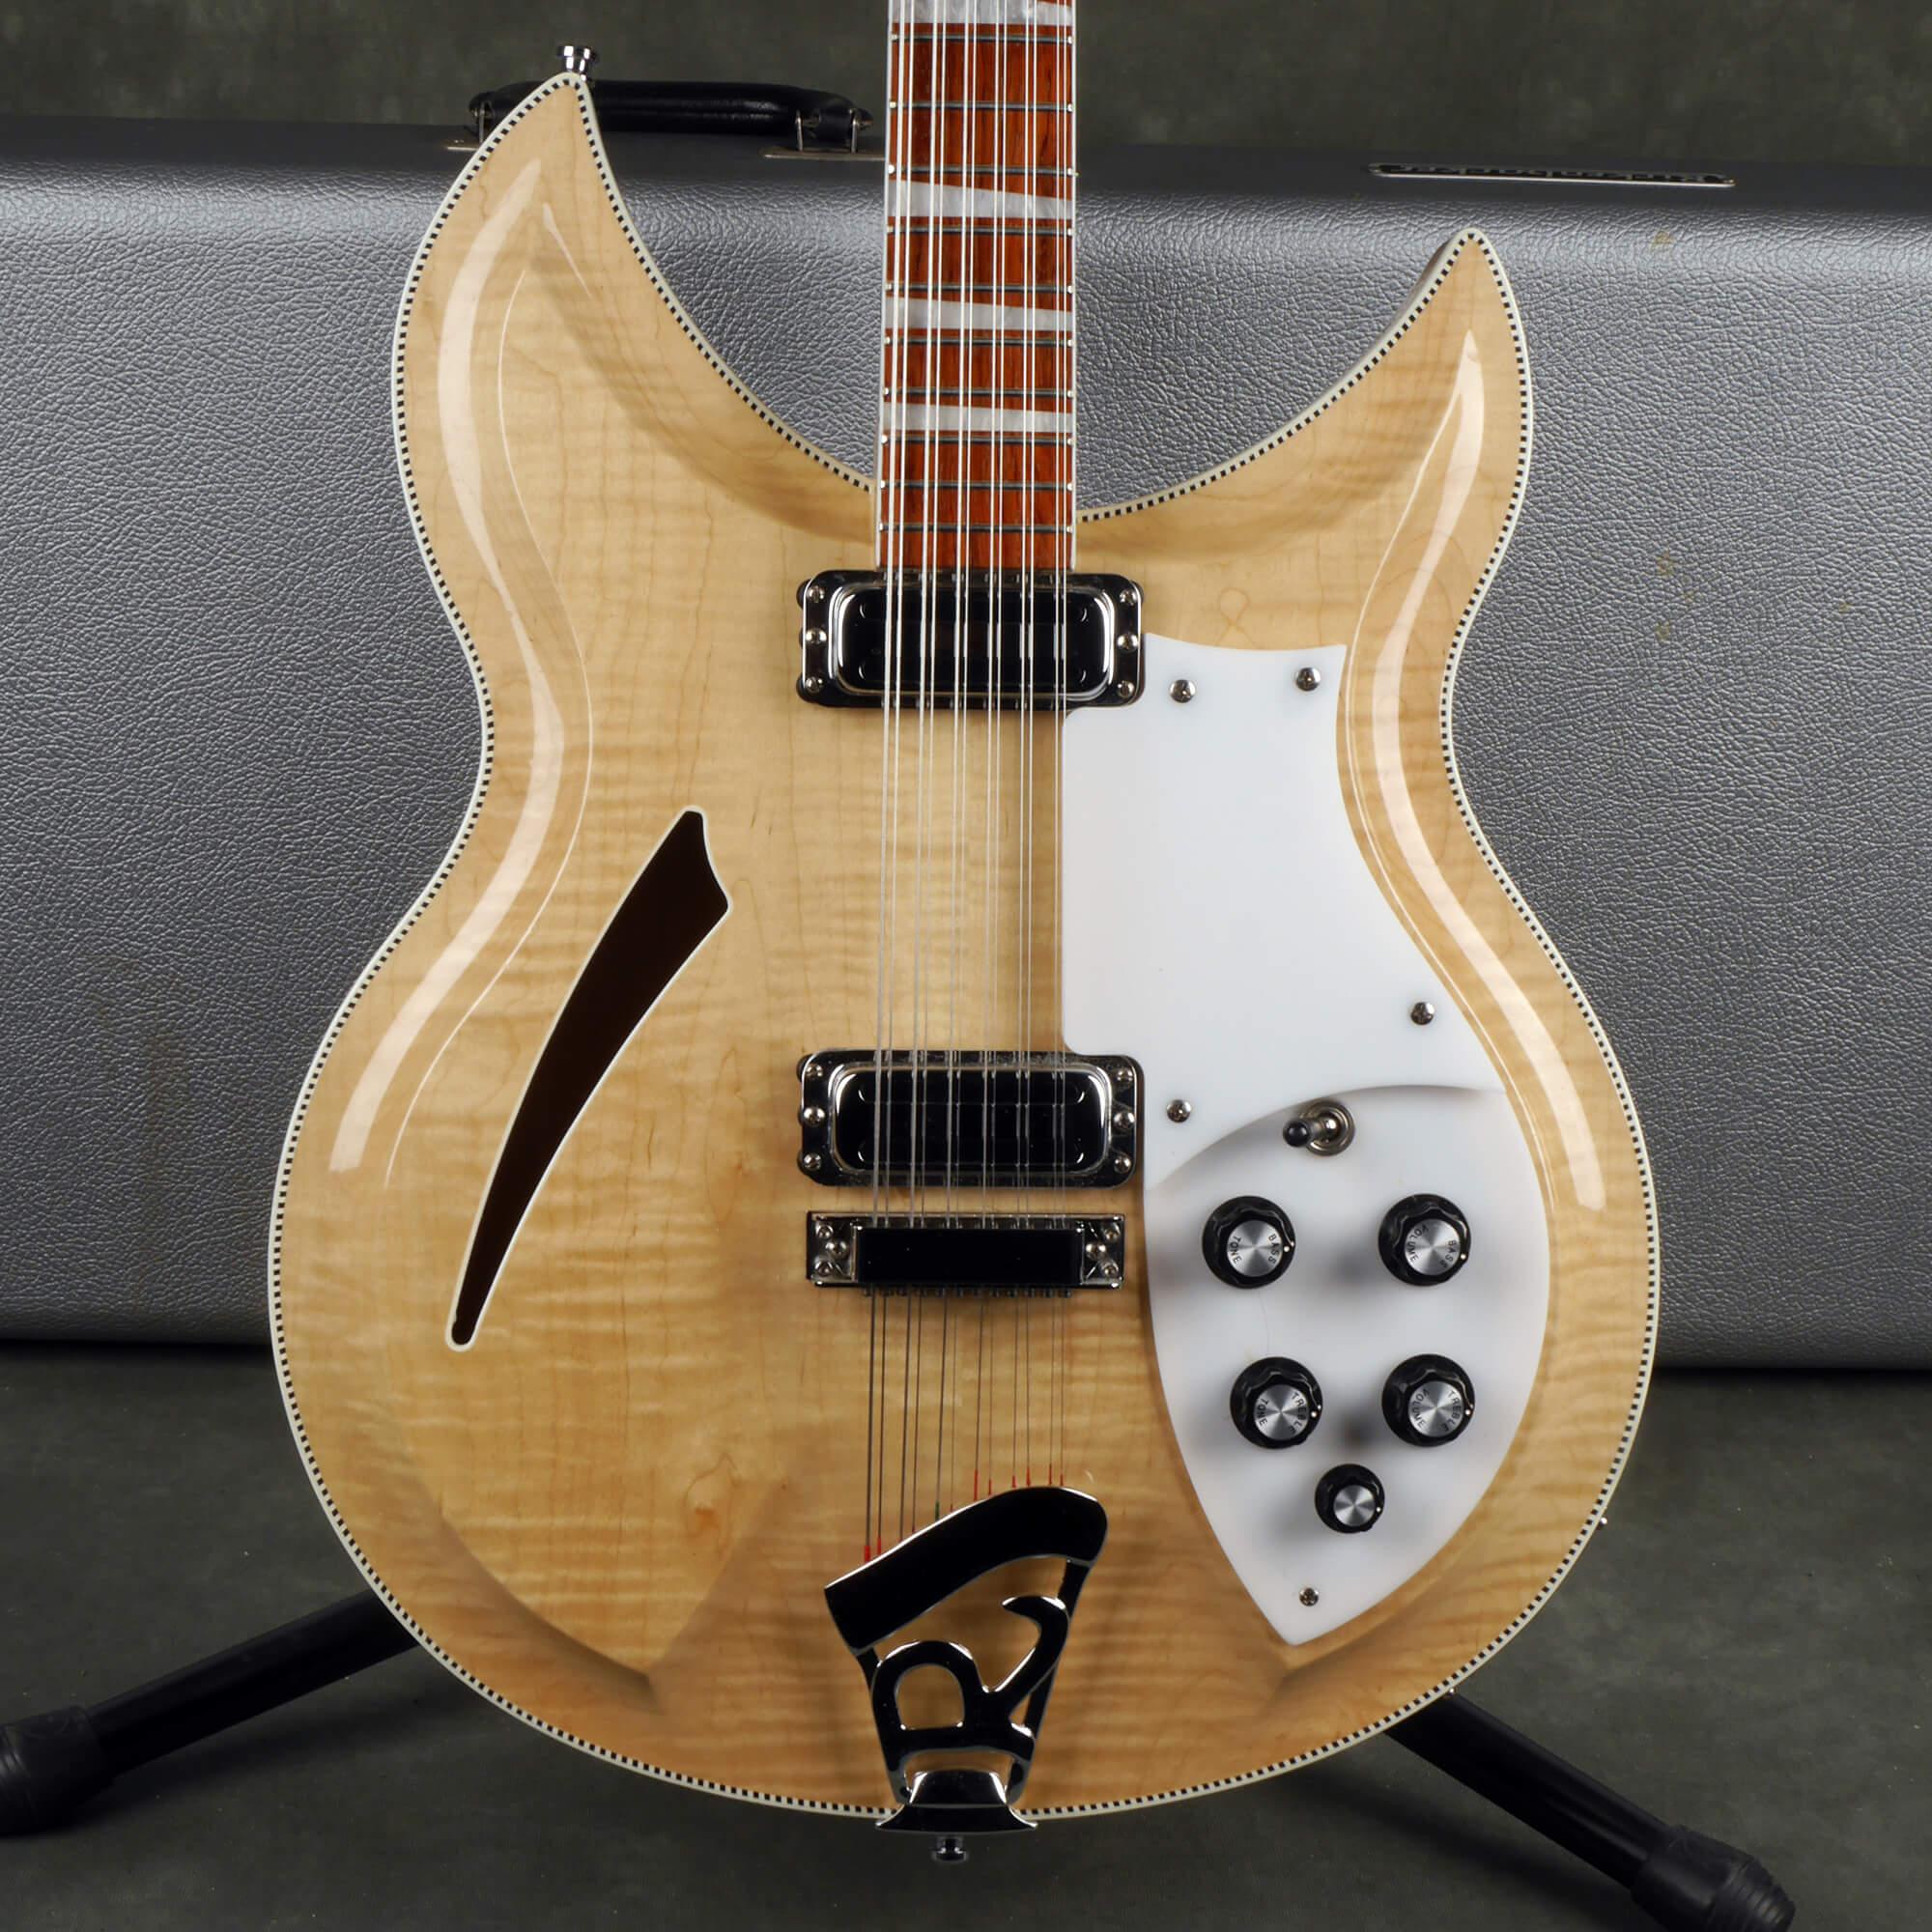 Rickenbacker 381/12v69 12 String - Mapleglo w/Hard Case - 2nd Hand